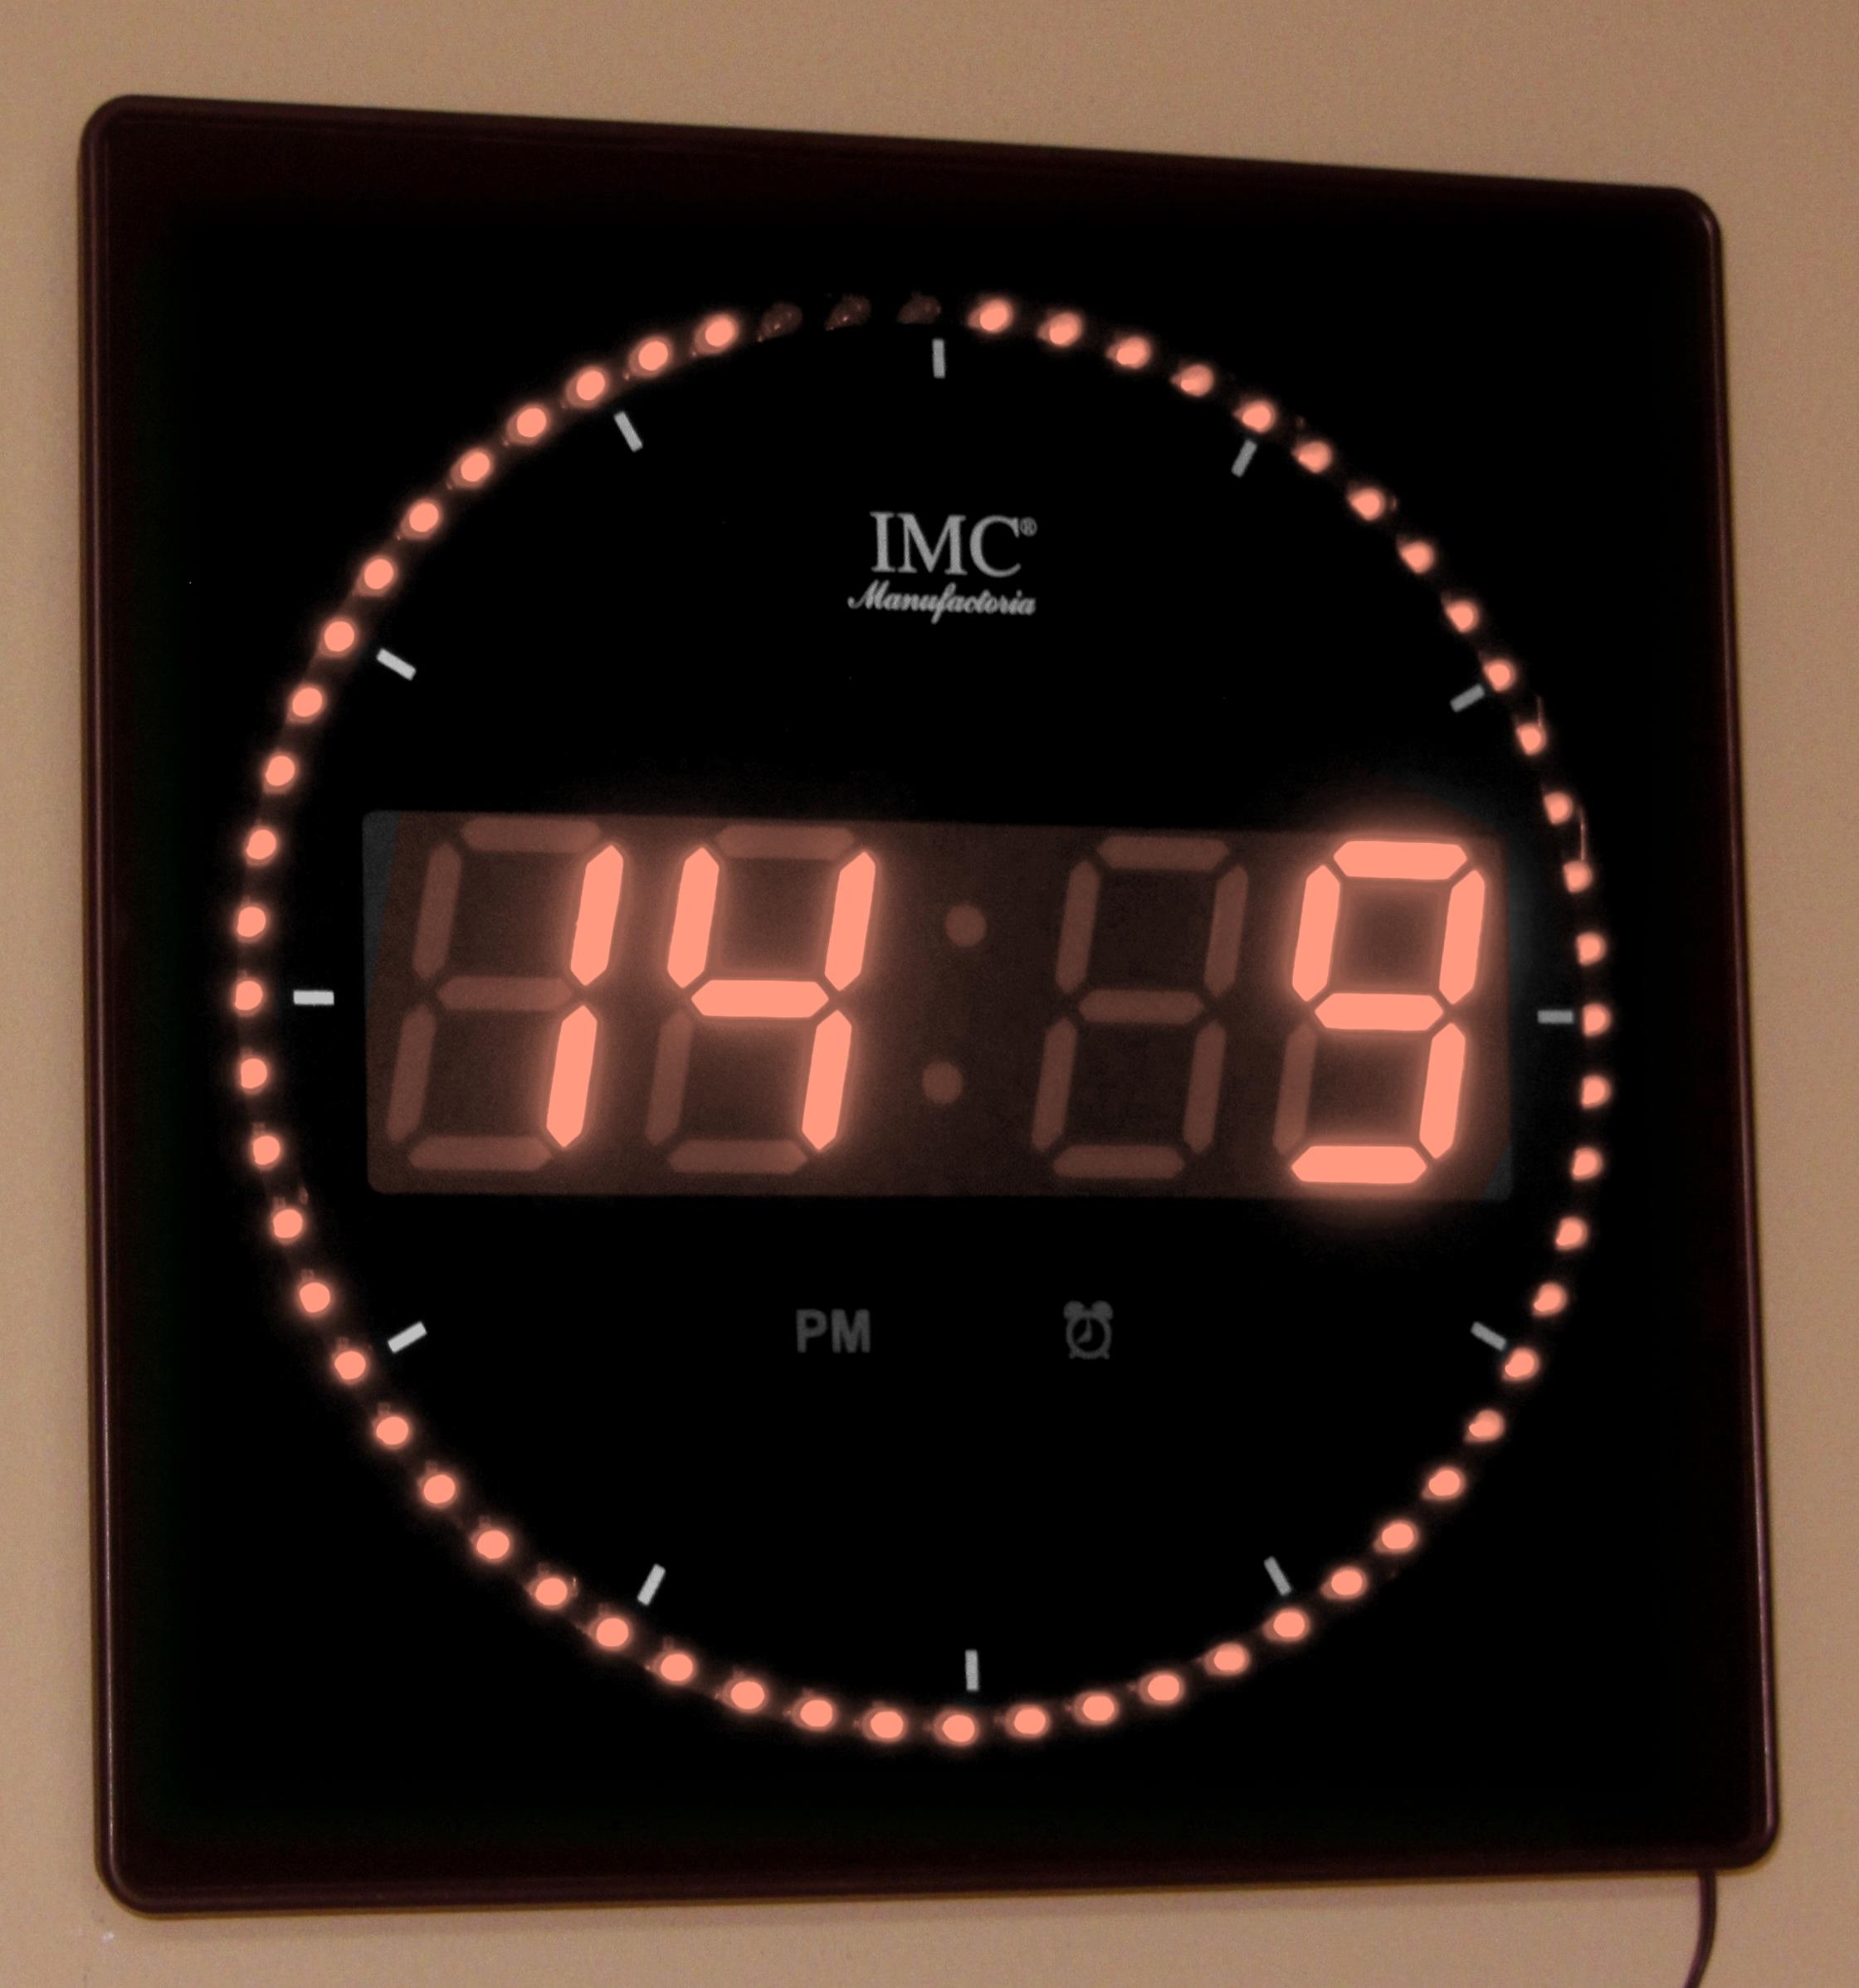 led wanduhr mit zahlen orange quadratisch digital uhr datum temperatur alarm s led wanduhren. Black Bedroom Furniture Sets. Home Design Ideas